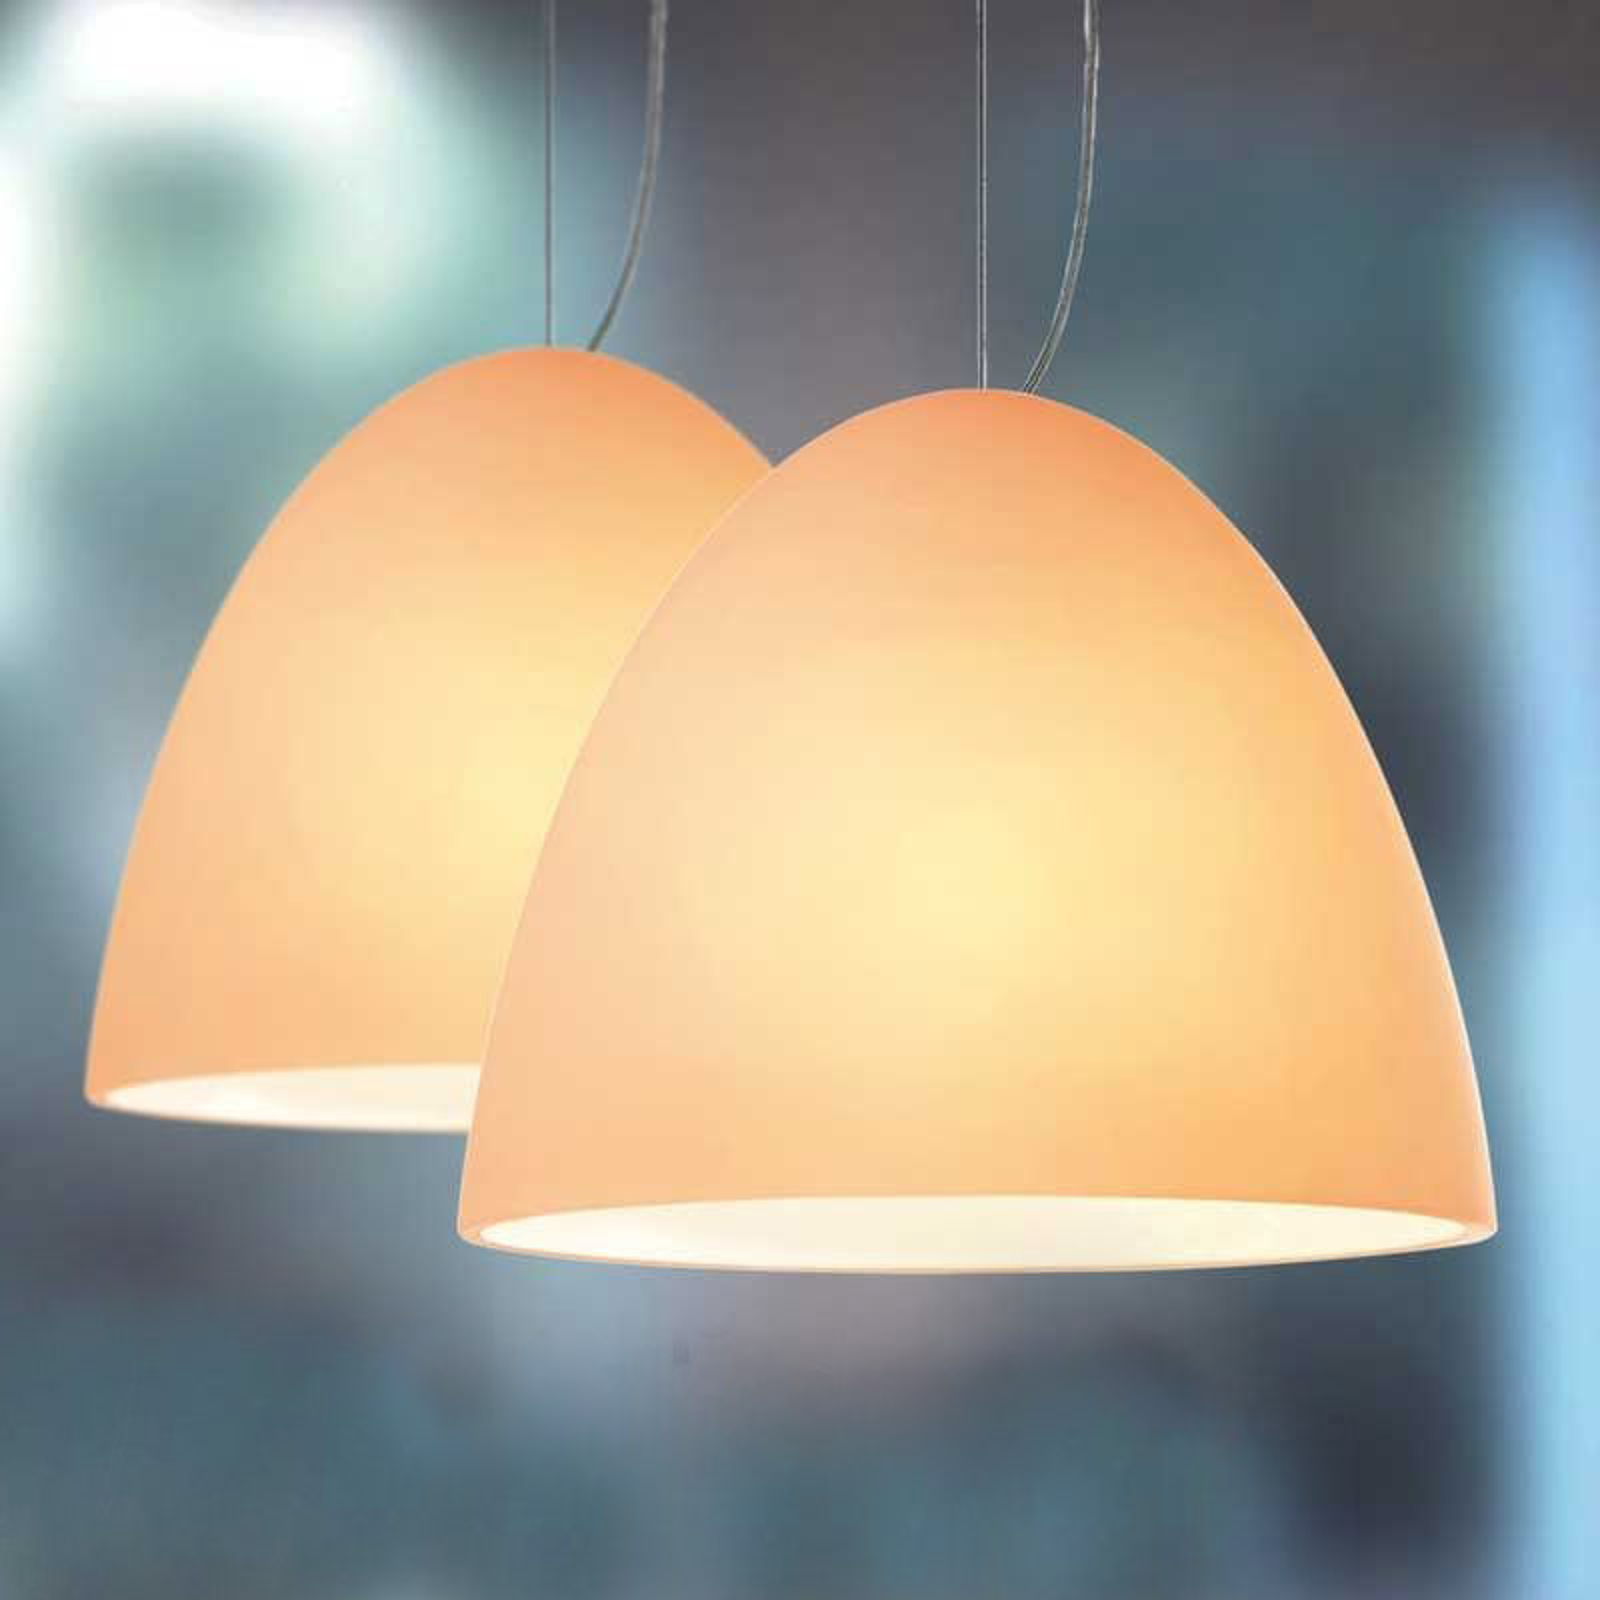 Lampa wisząca BELL 21cm 2-punktowa piaskowa